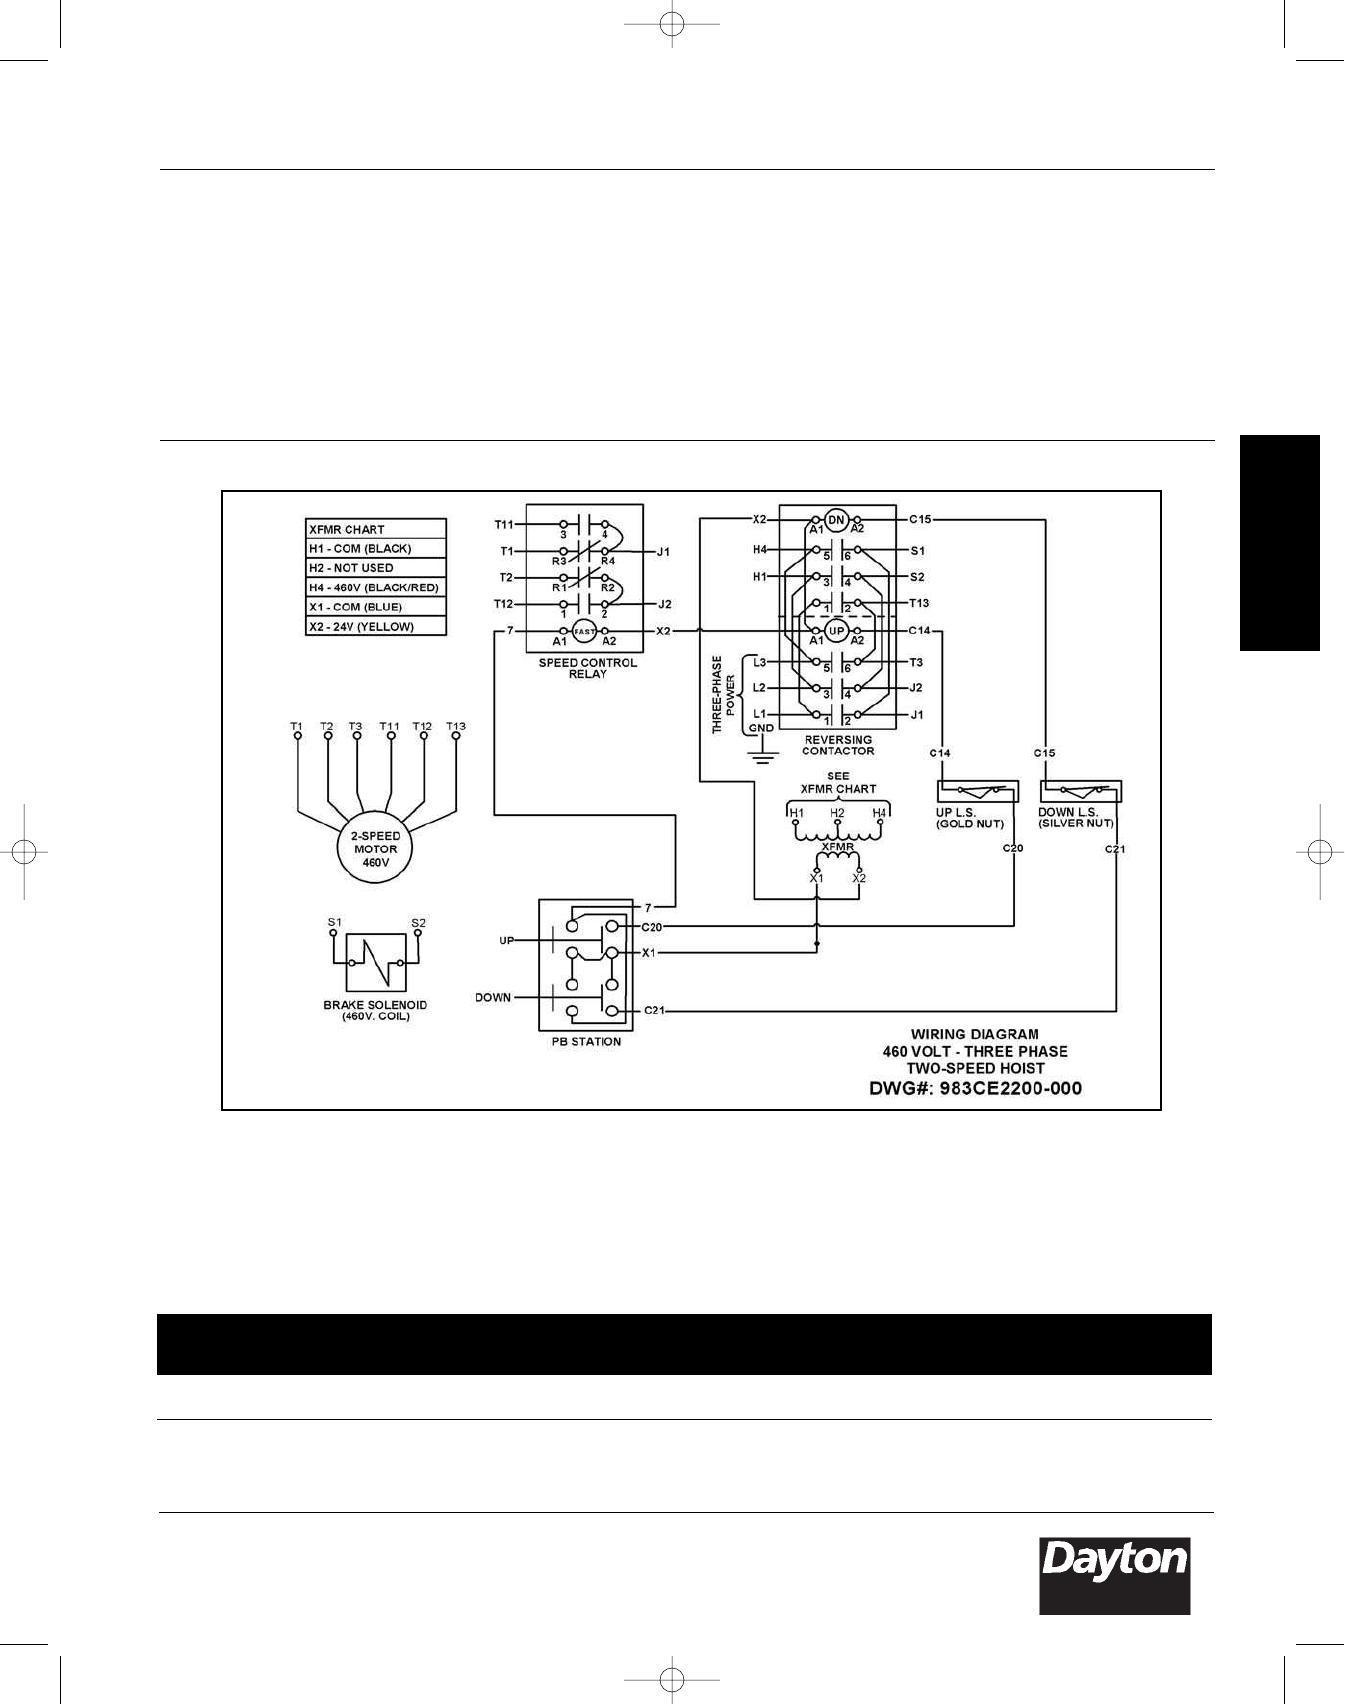 hight resolution of wiring model electric diagram motor 6k882c wiring diagrams simple wiring model electric diagram motor 6k882c